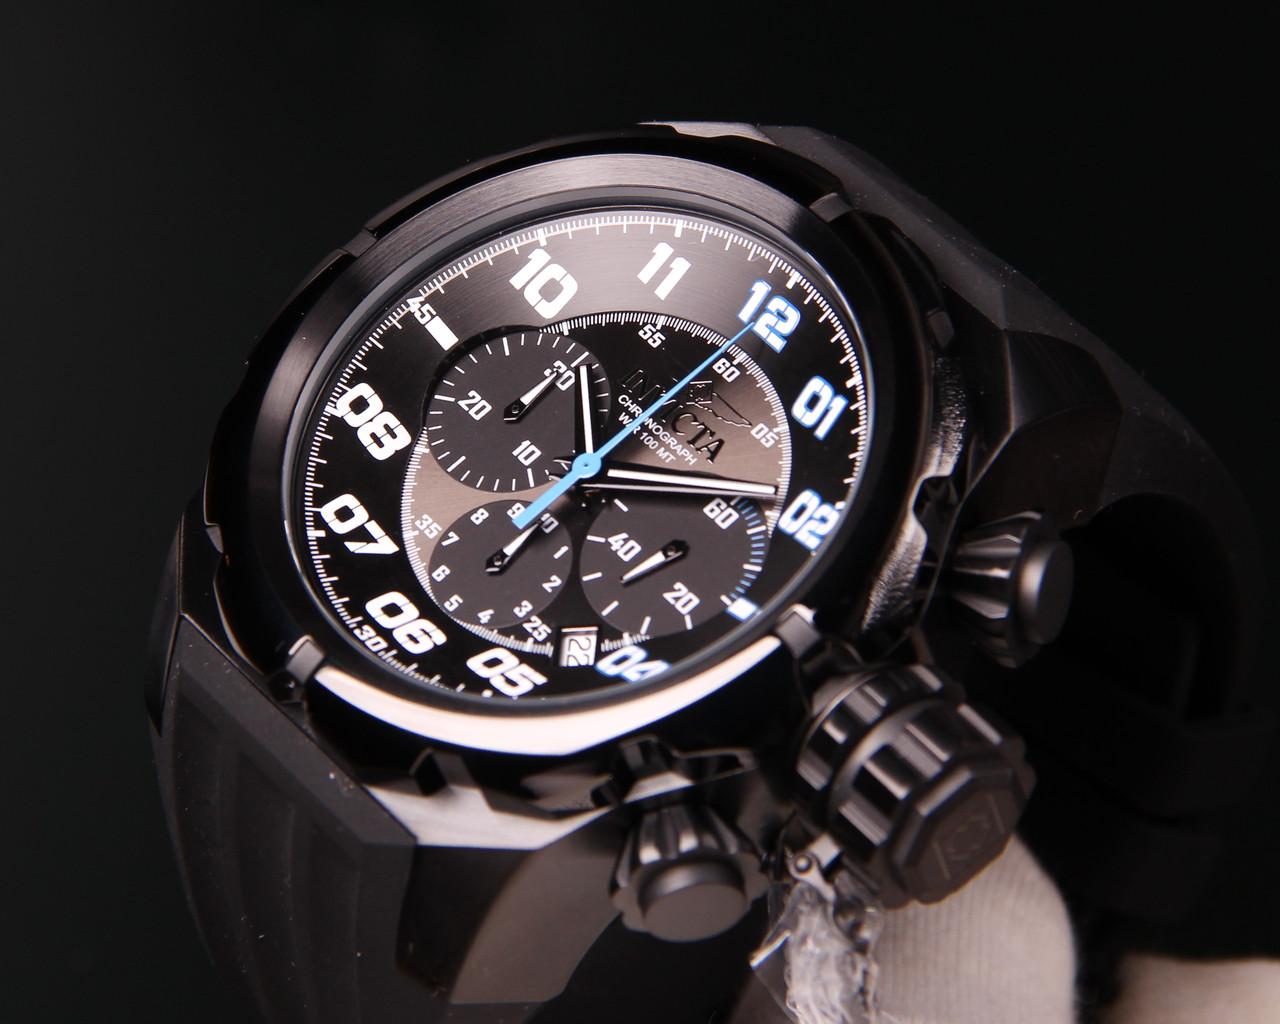 Мужские часы Invicta 22420 Russian Diver, цена 5 727,50 грн., купить ... 93c4ed912e1